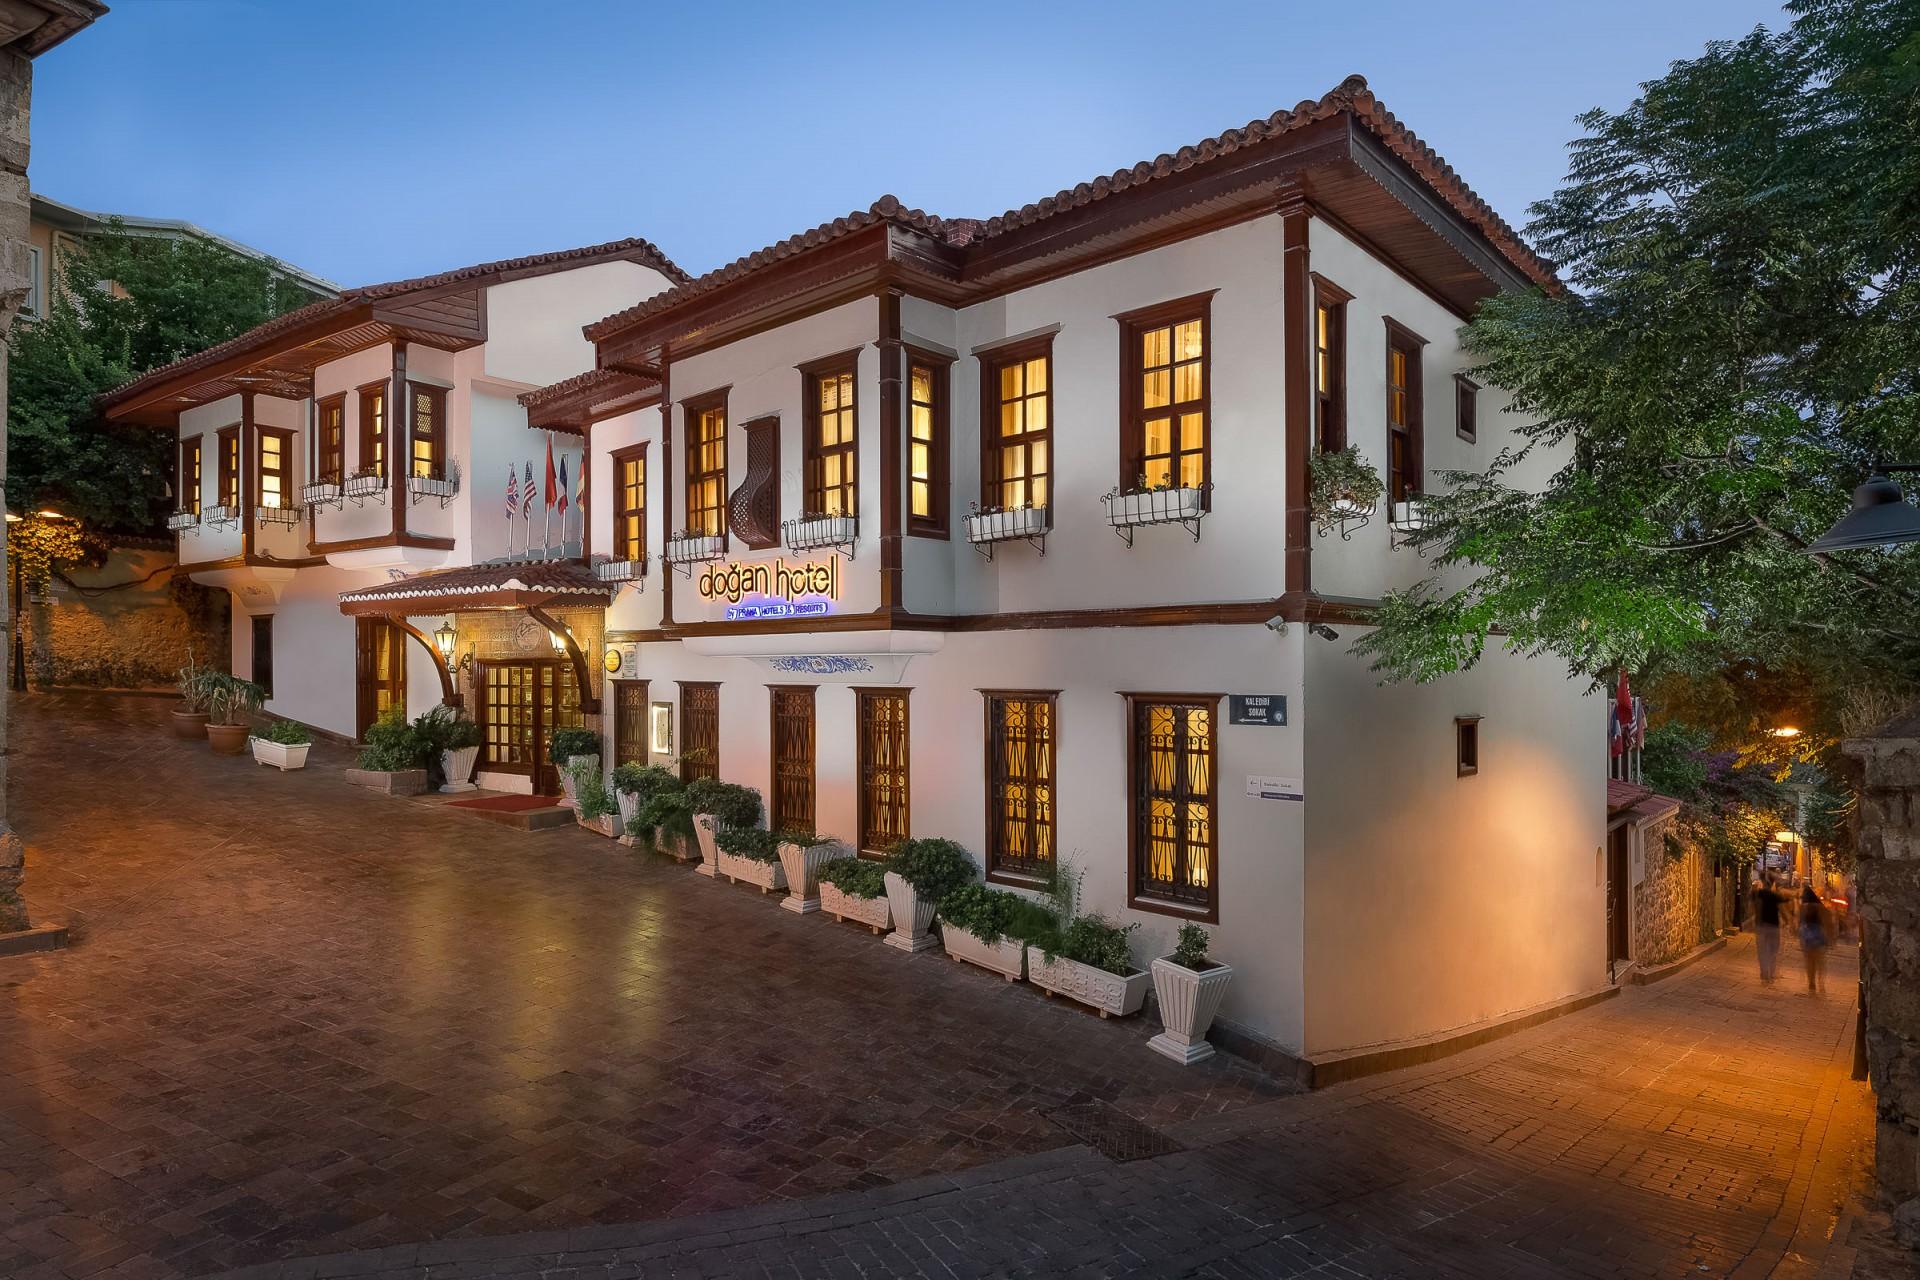 Best Architecture Photographer Kaleici Antalya Turkey   Prana Resorts Dogan Hotel Facade Photography Antalya Turkey